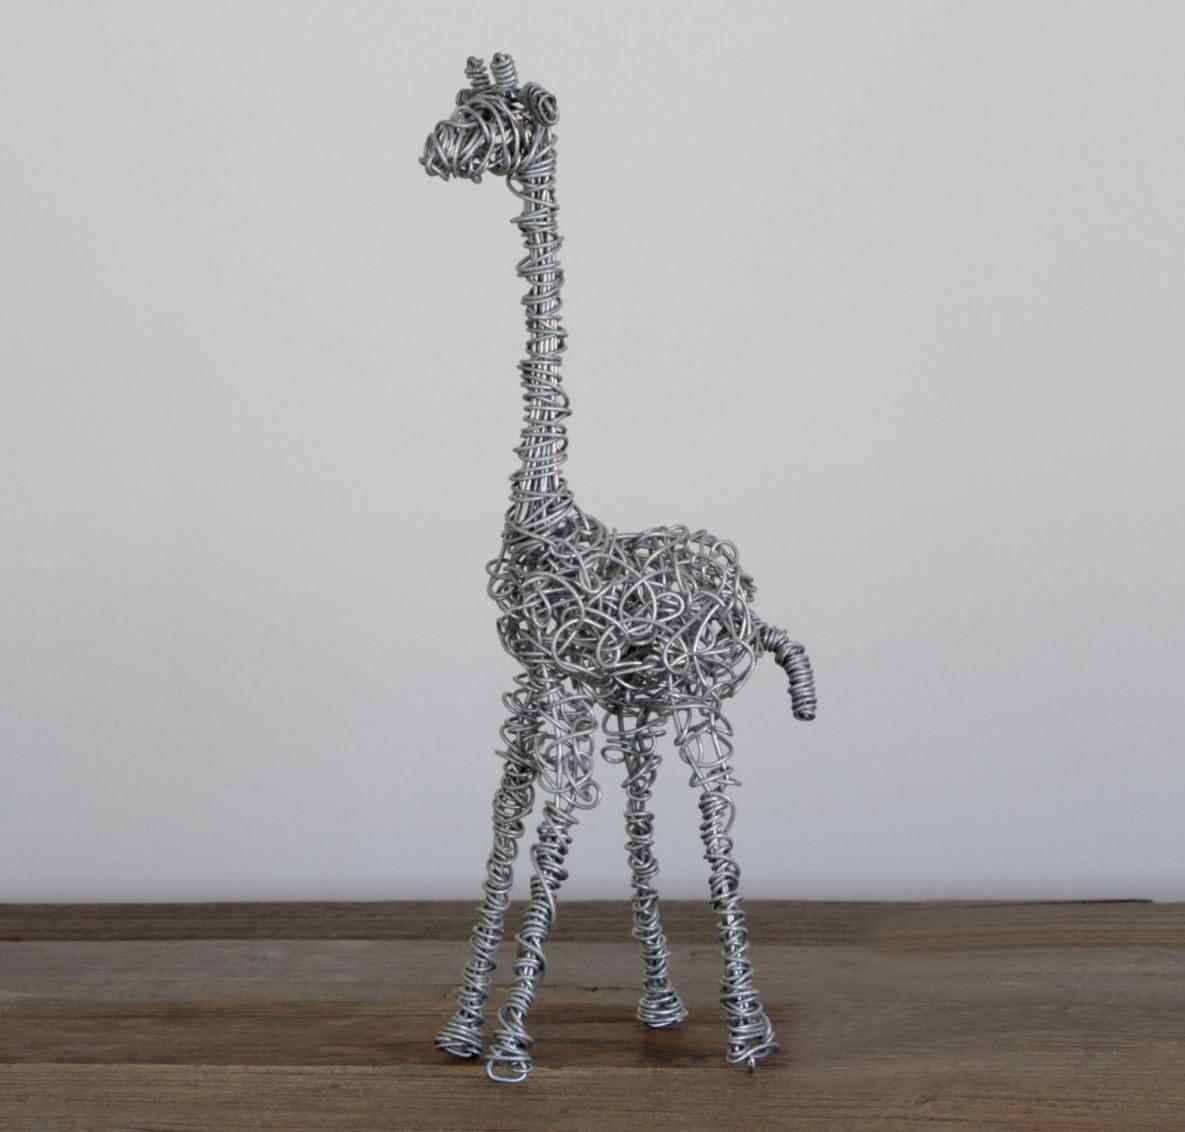 African Forestu Modern Animal Designart Giraffe Metal Wall Art With Regard To Most Up To Date Giraffe Metal Wall Art (View 1 of 20)